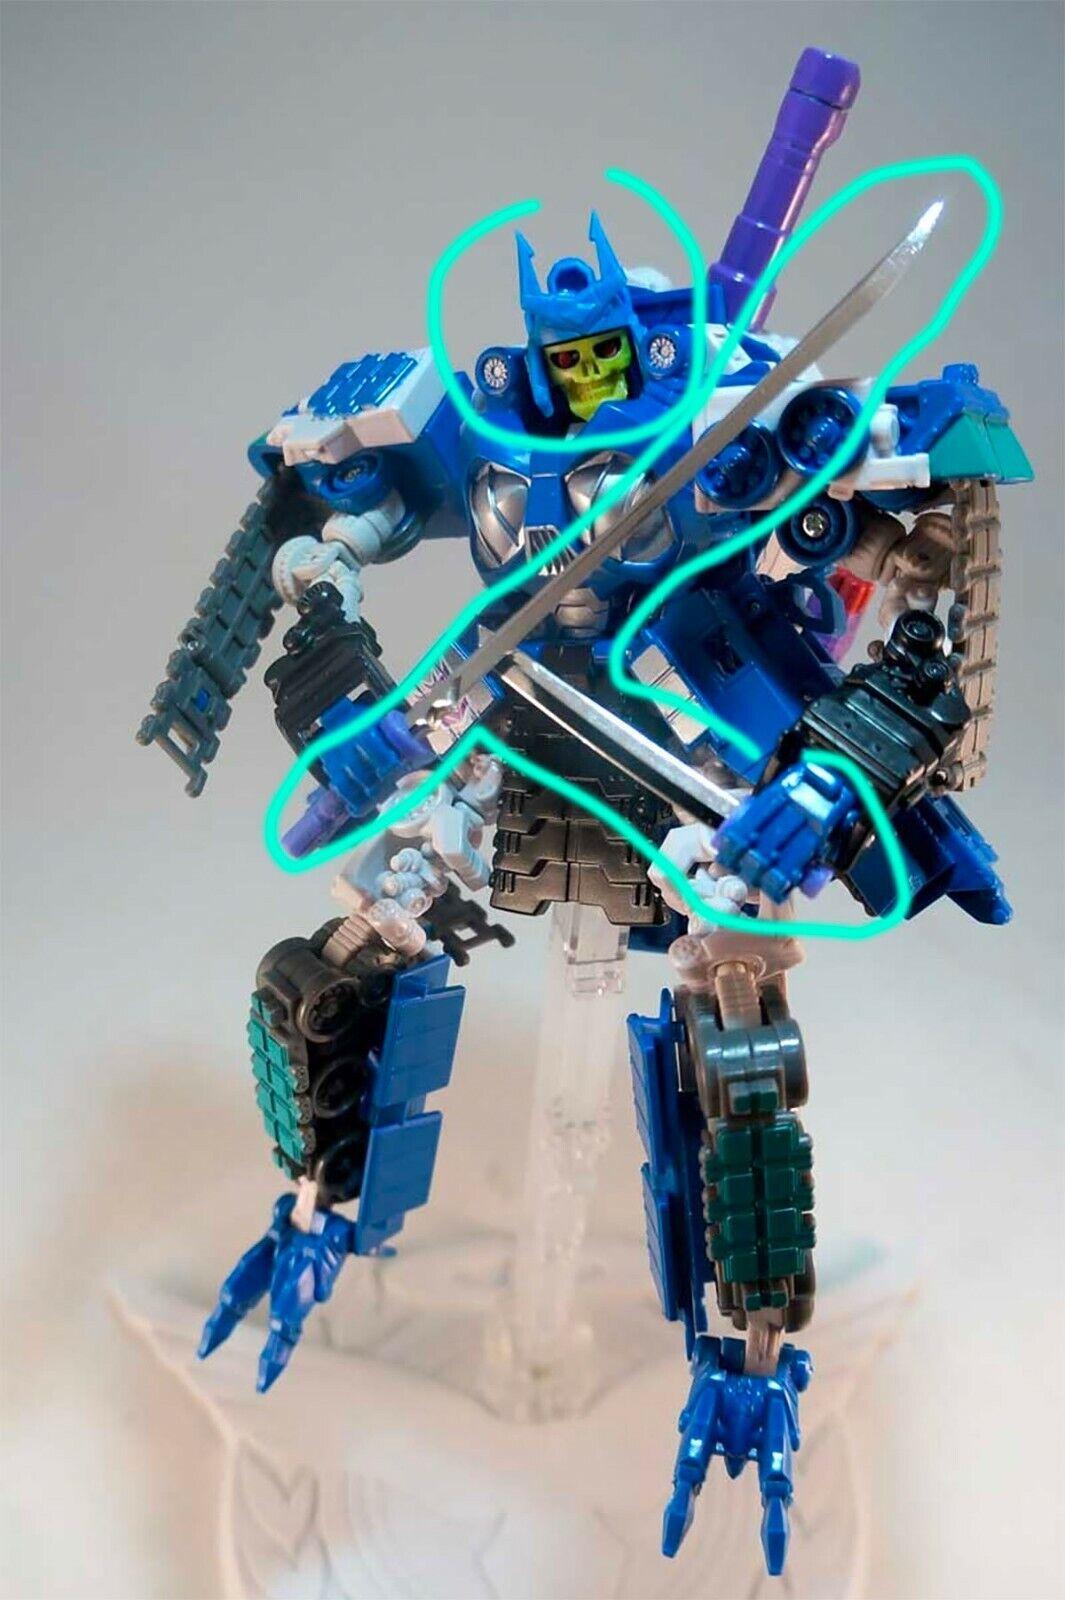 Transformers Headrobots Headmasters SKELETRON skeletor overlord Botcon 2012